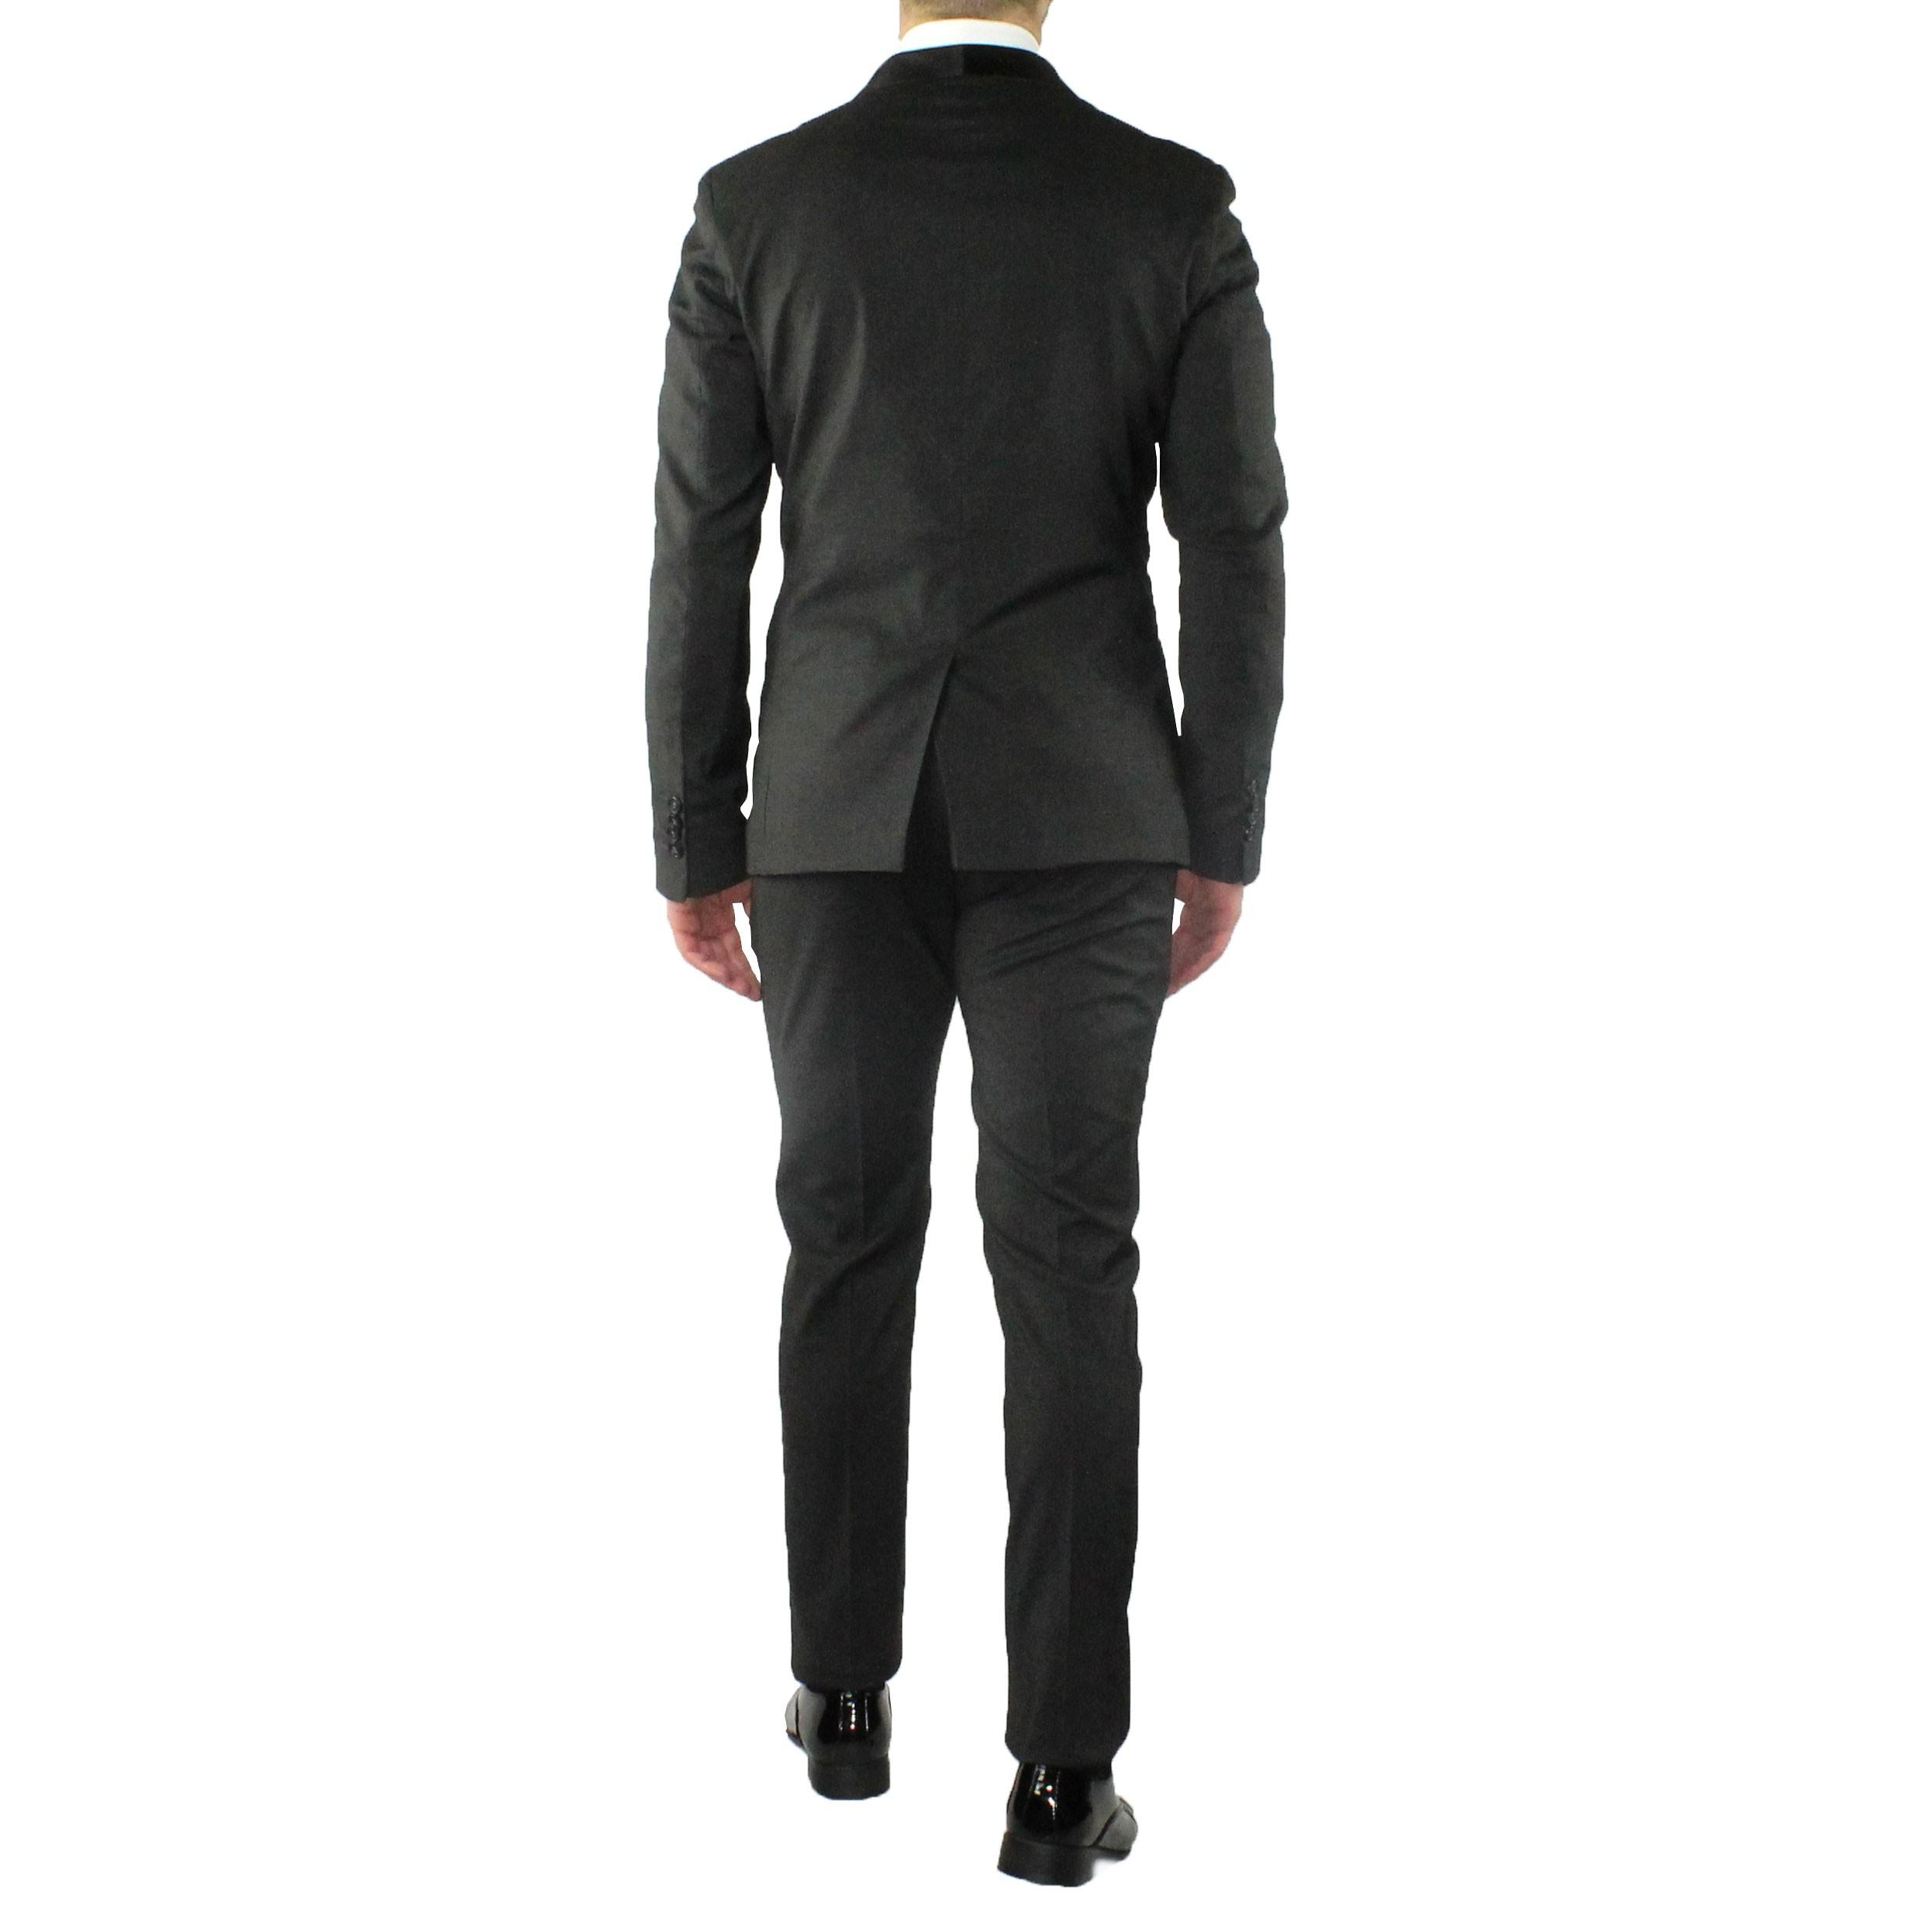 Abito-Uomo-Smoking-Elegante-Vestito-Completo-Estivo-Cerimonia-Sartoriale-Slim miniatura 13